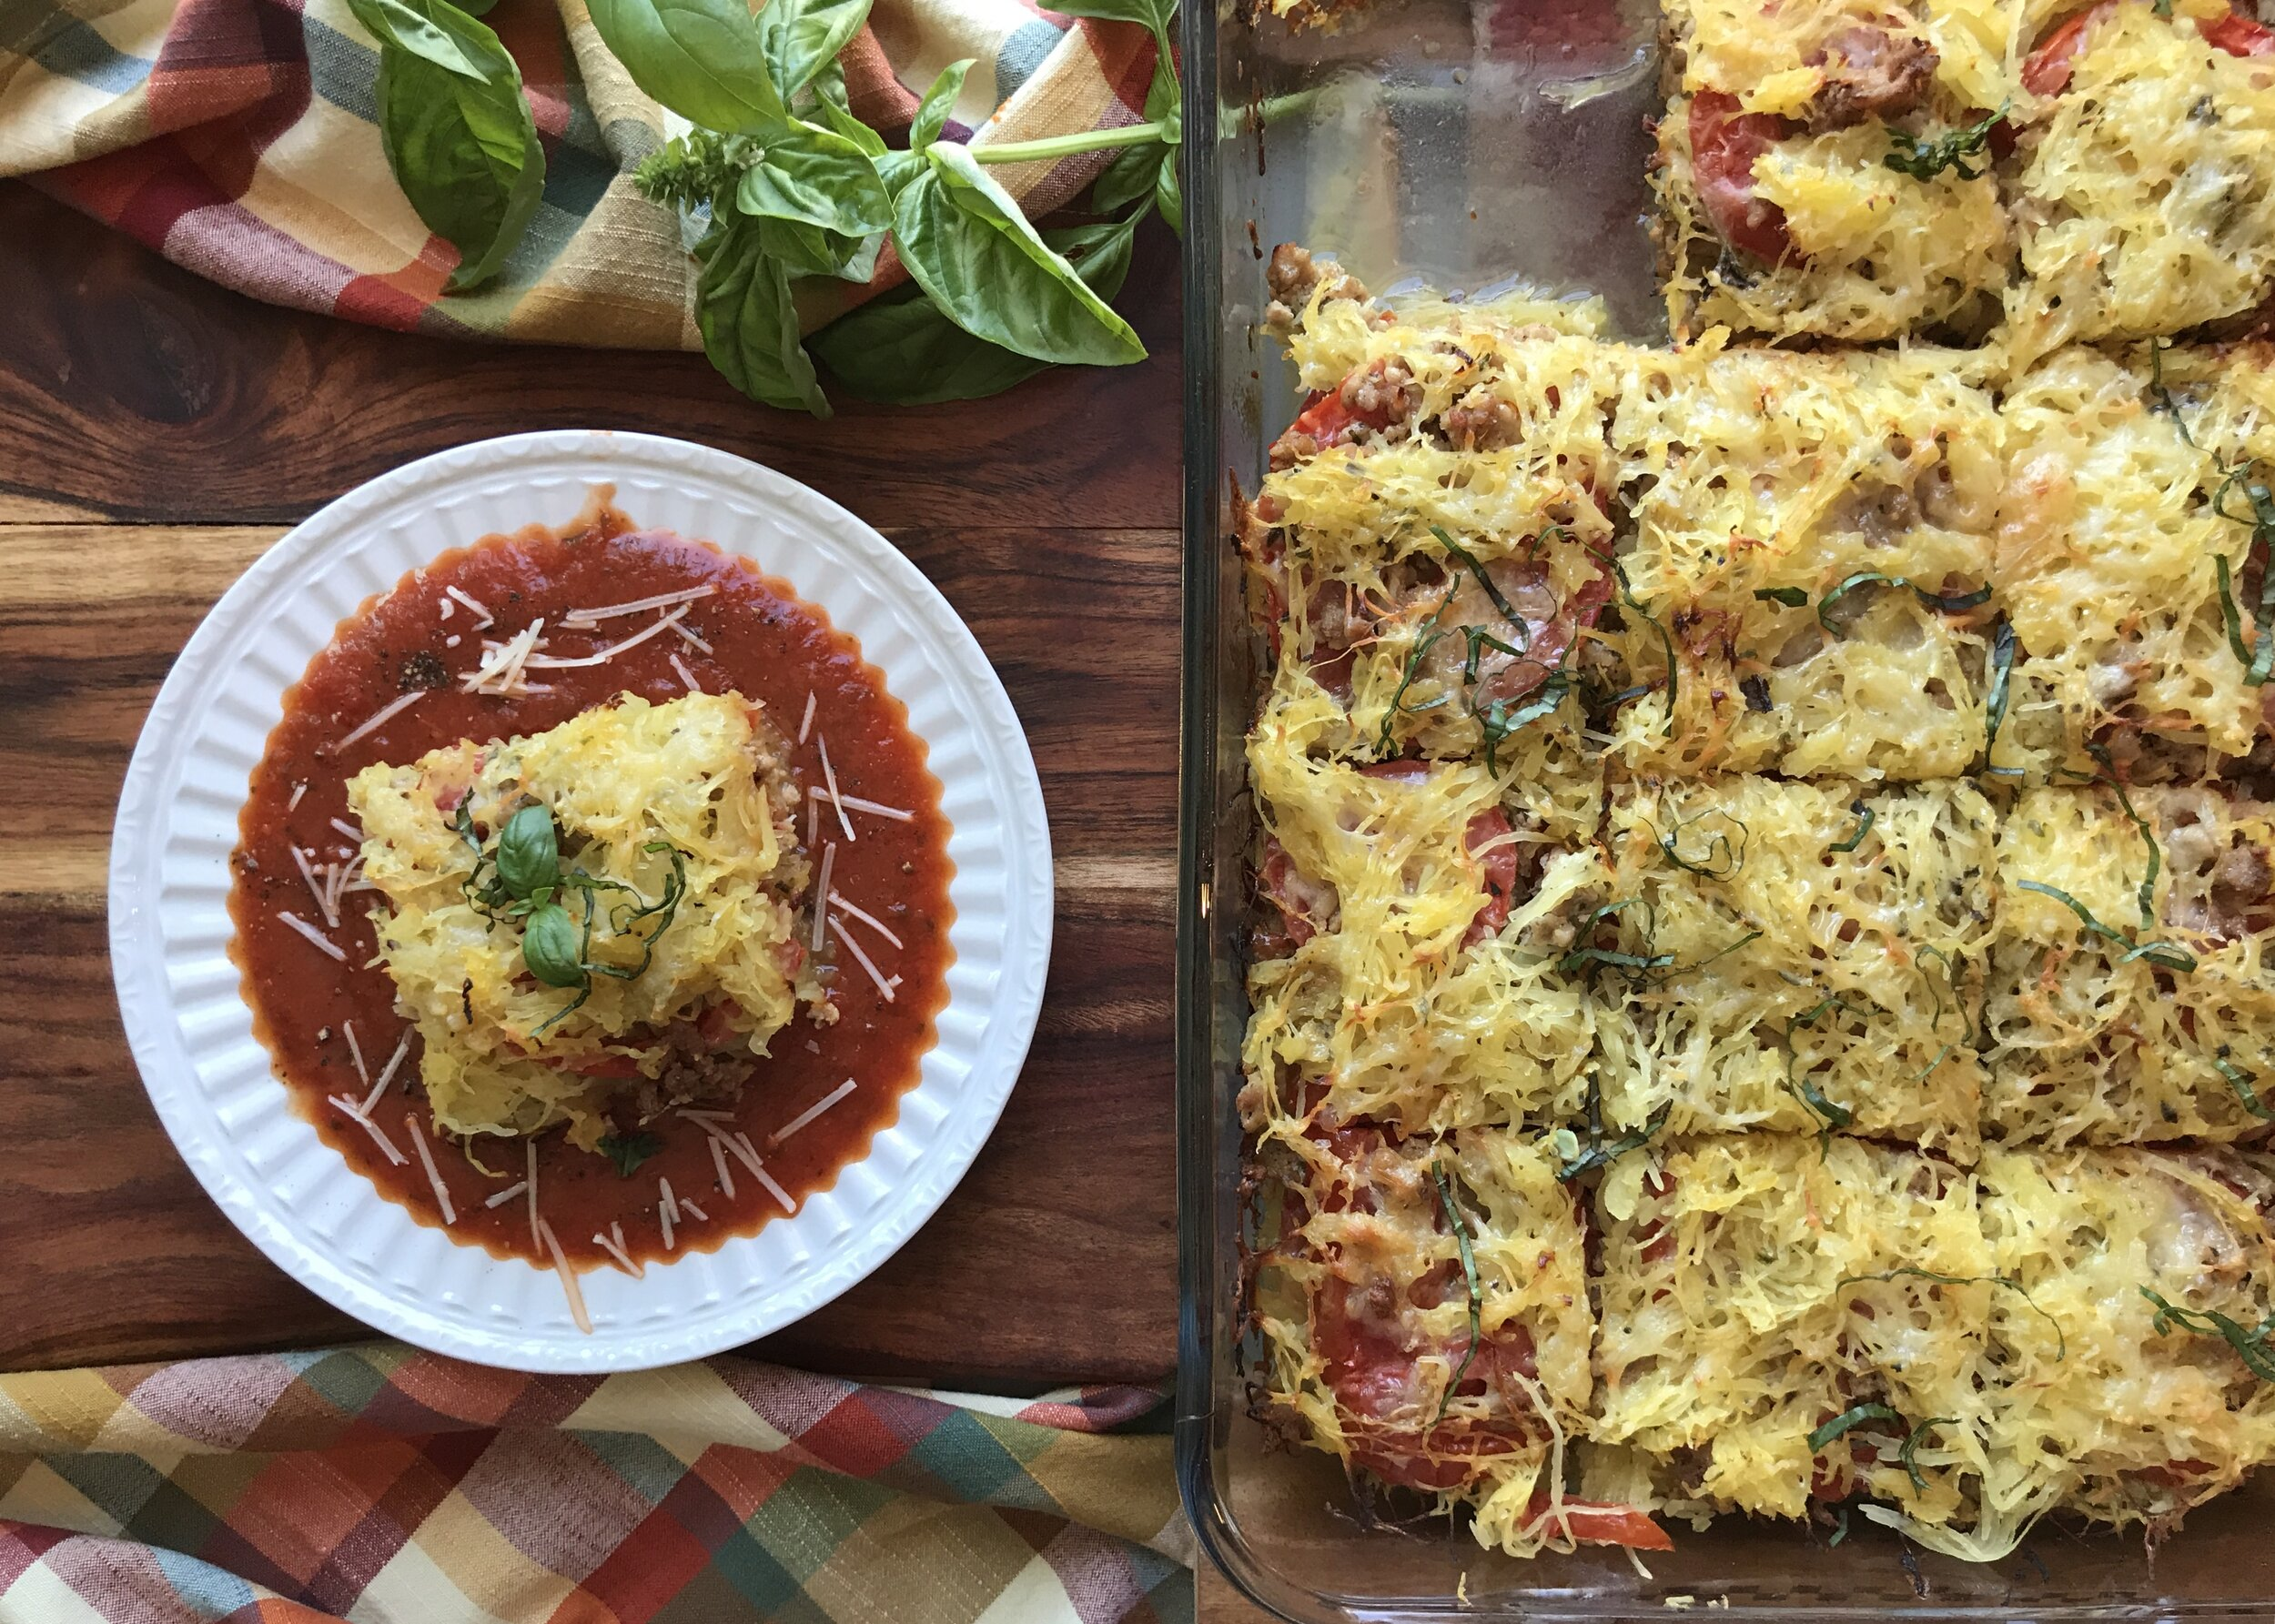 Spaghetti squash lasagna recipe. Photo credit: Anita McVey/Picnic Life Foodie